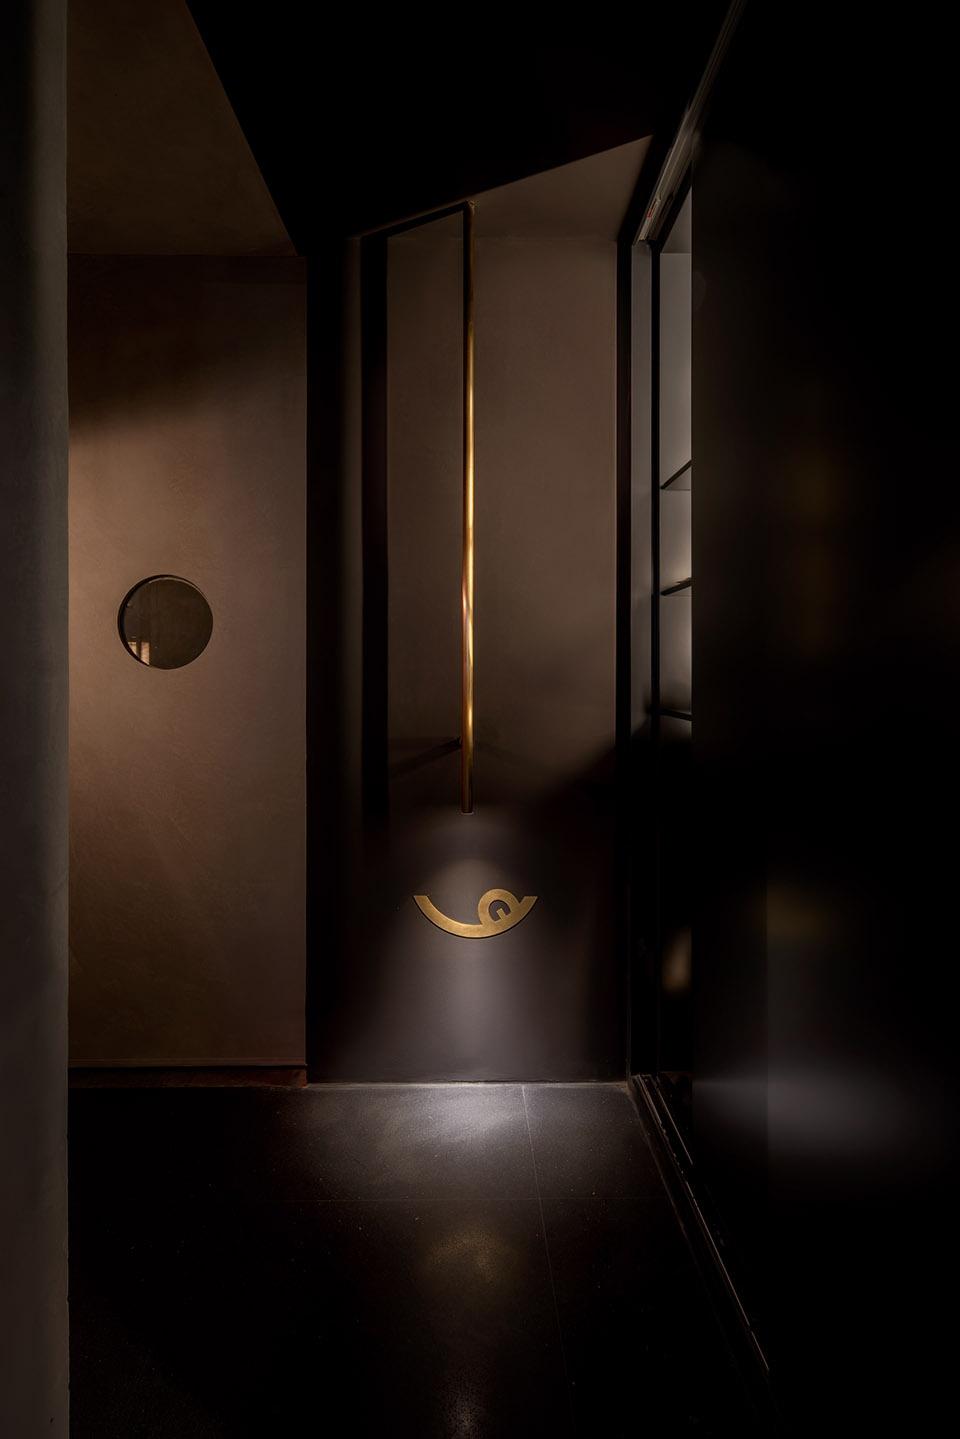 025-the-tasting-room-china-by-ge-studio-960x1439.jpg